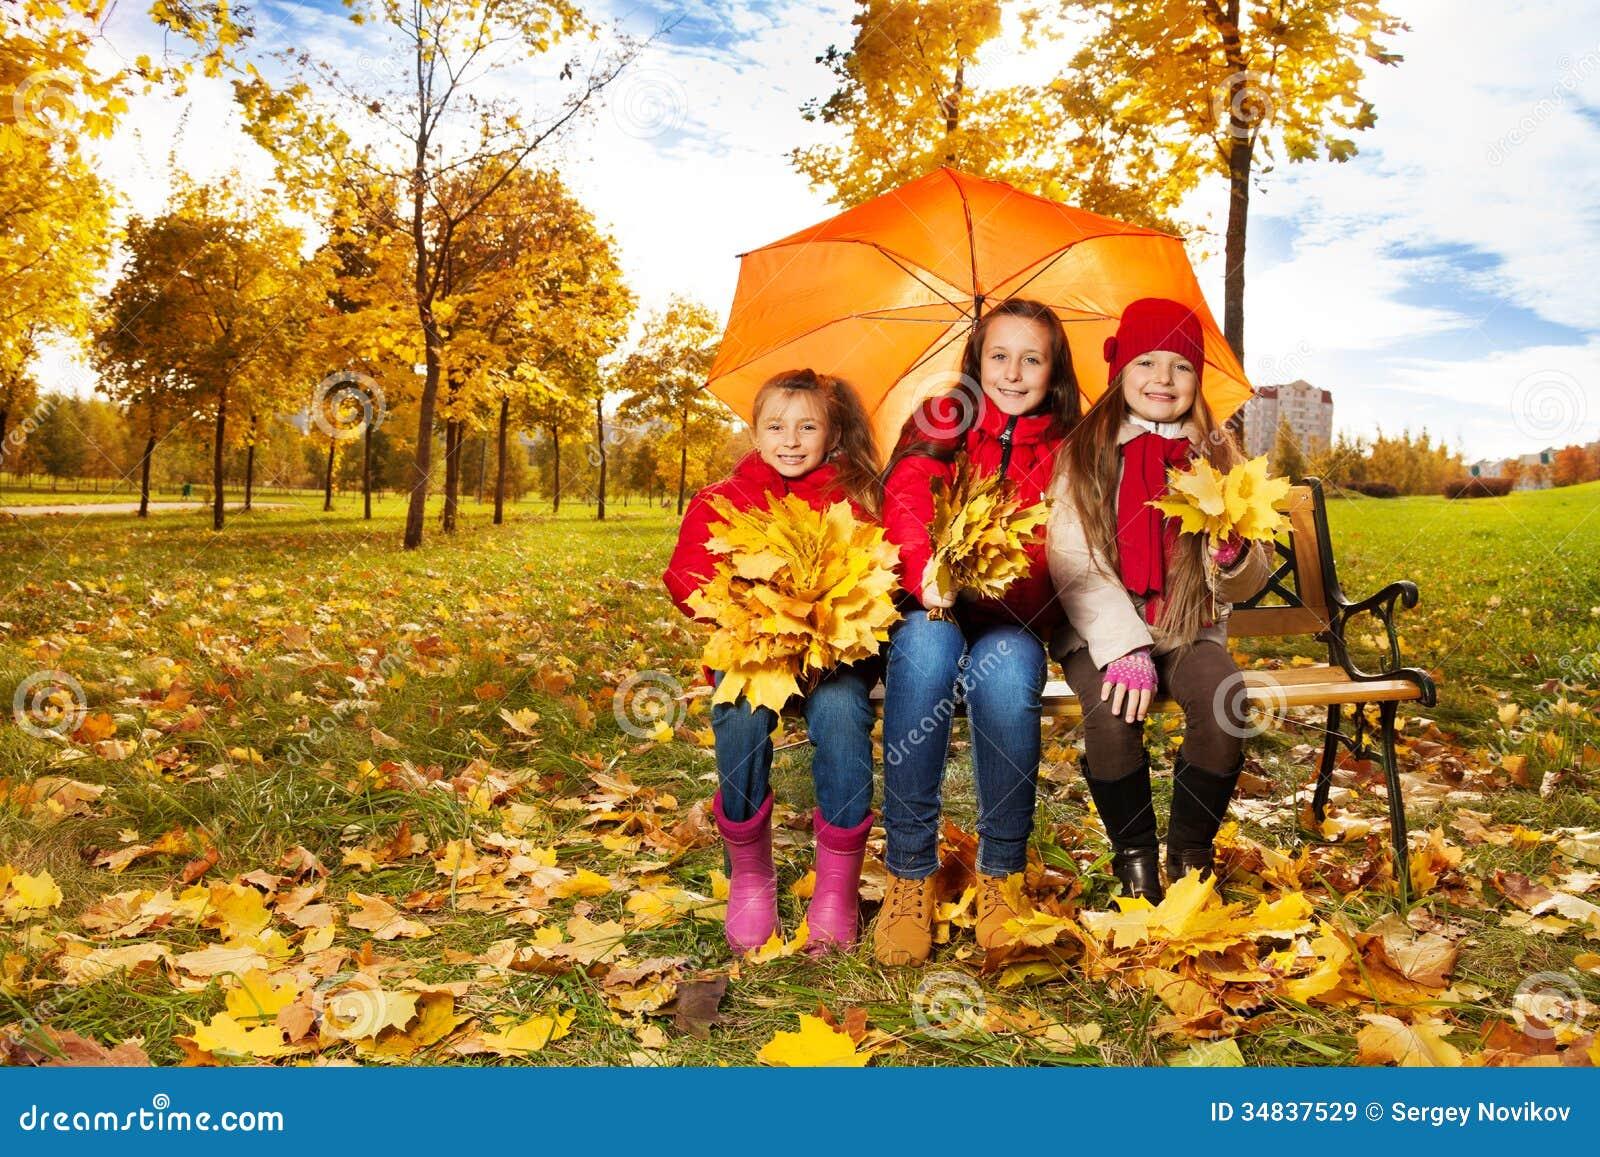 Girls Under Umbrella In Autum Park Royalty Free Stock